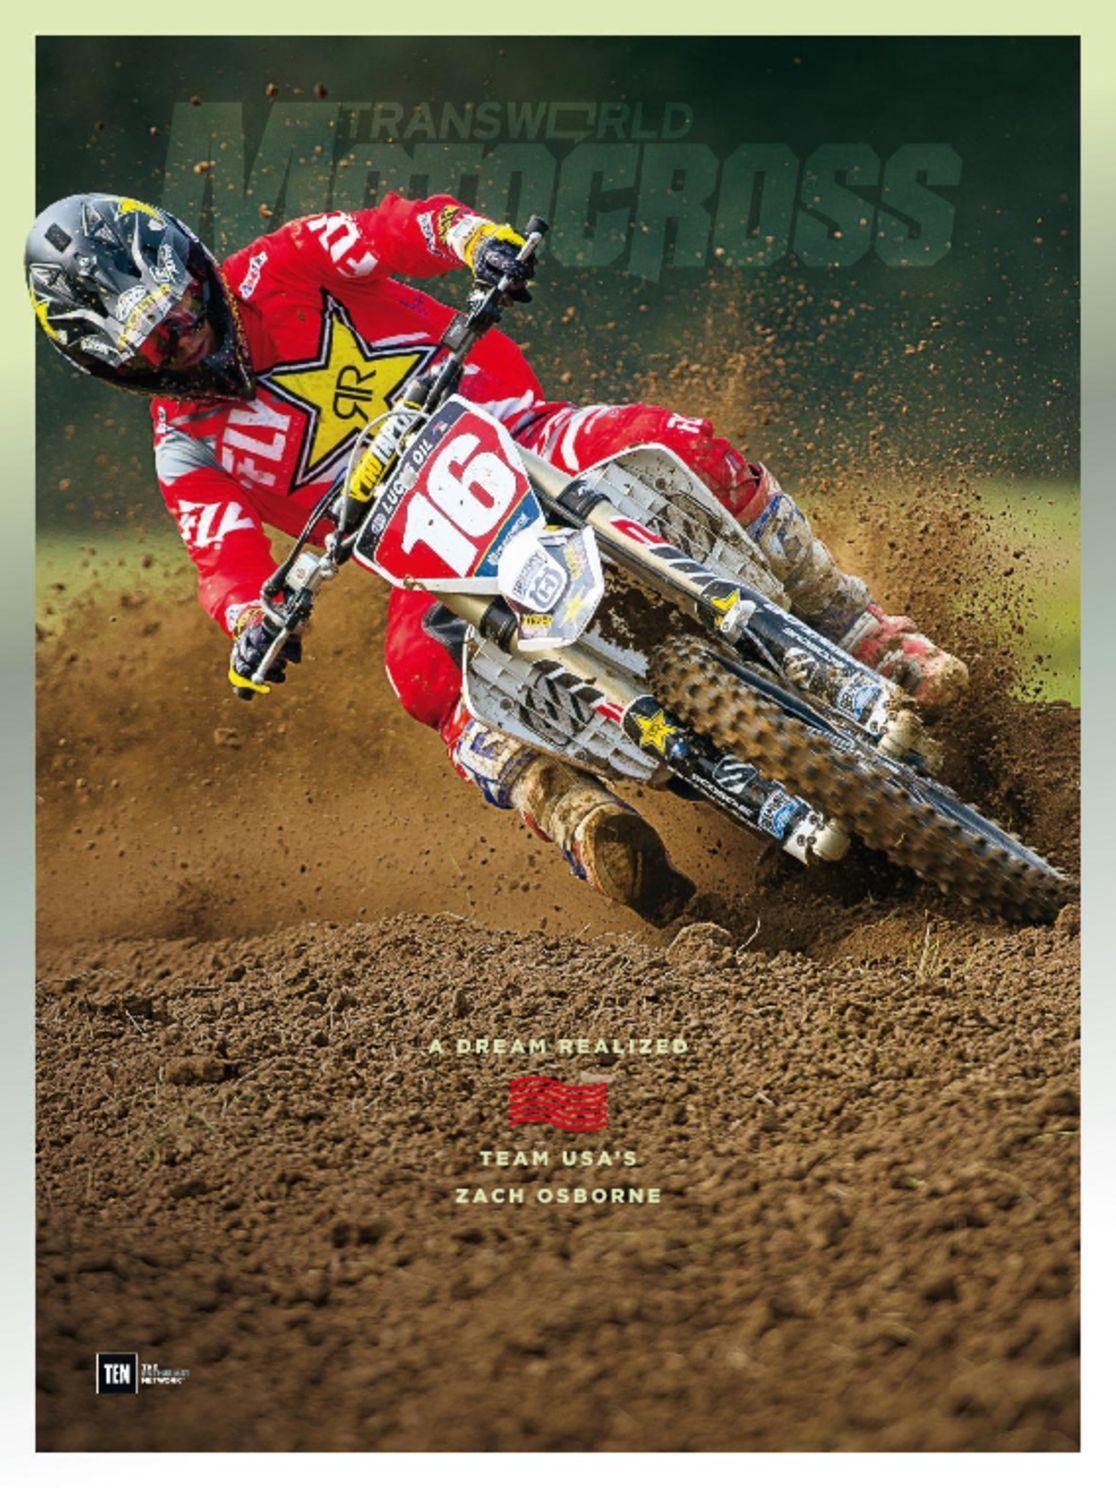 Motocross Transworld Magazine Subscription